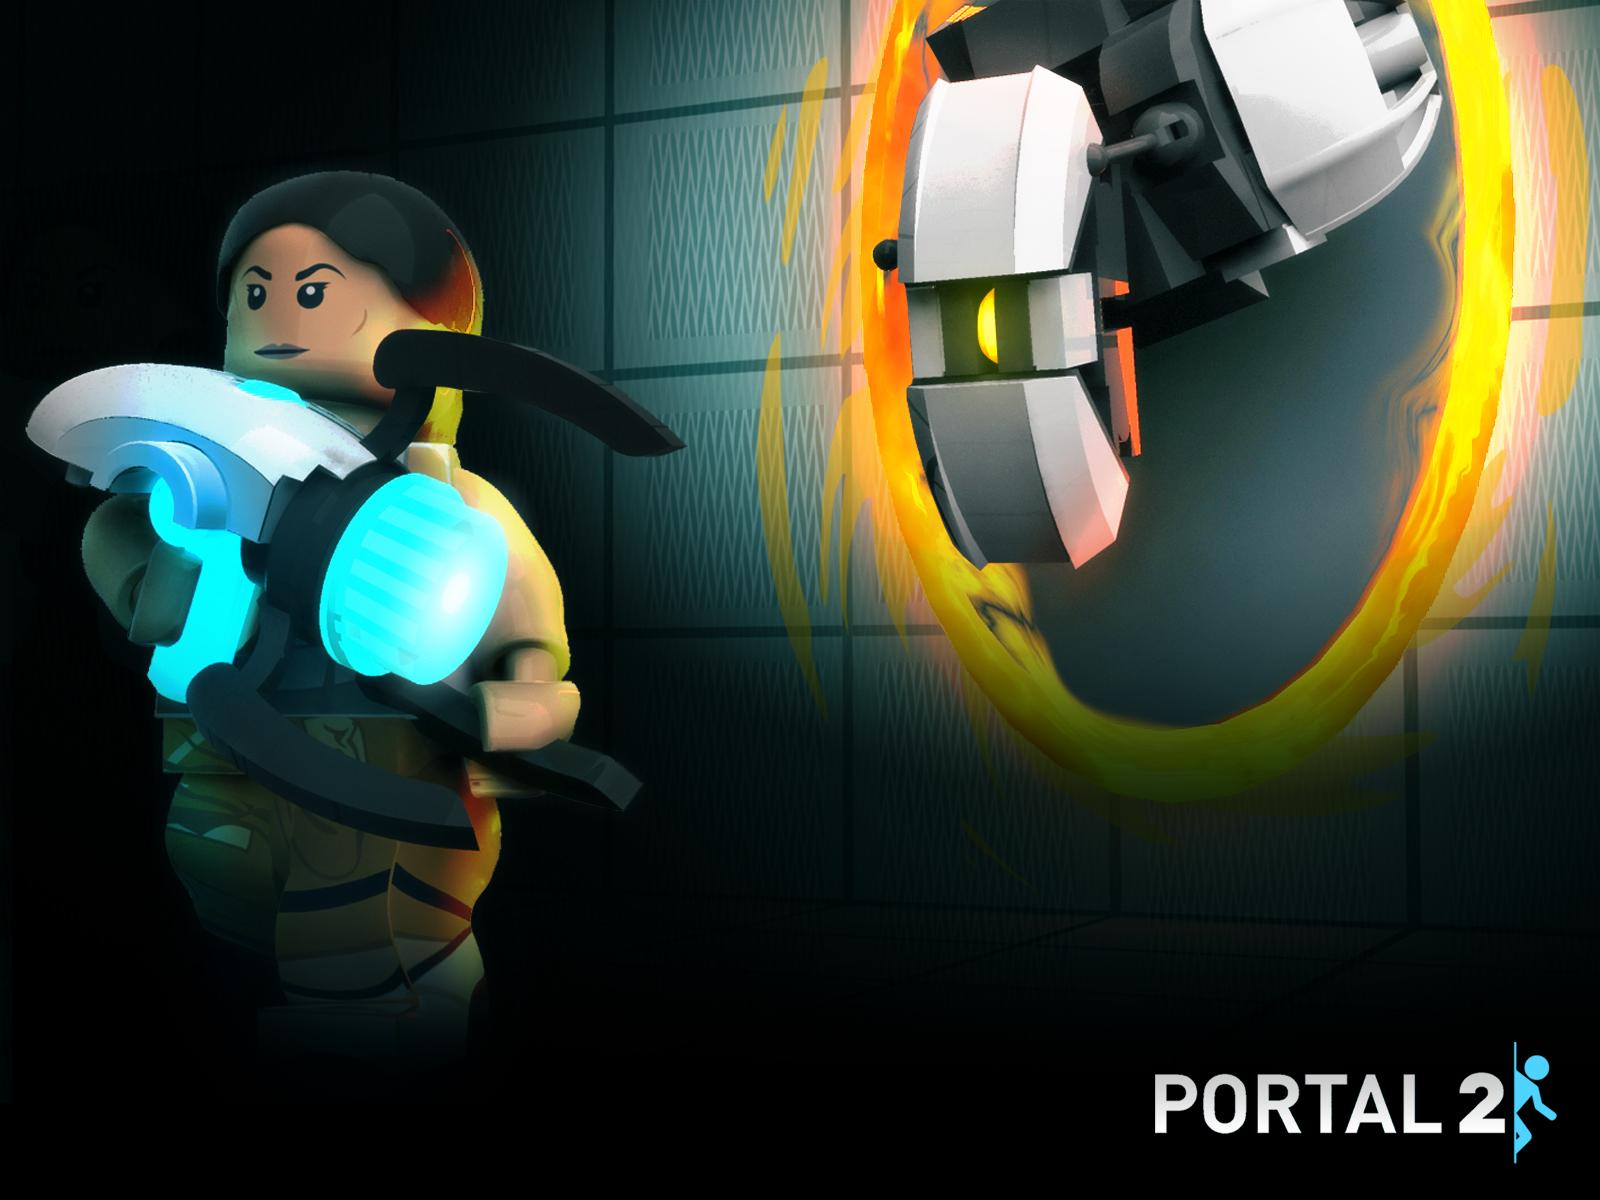 7266 portal athenahealth - 7266 Portal Athenahealth 25